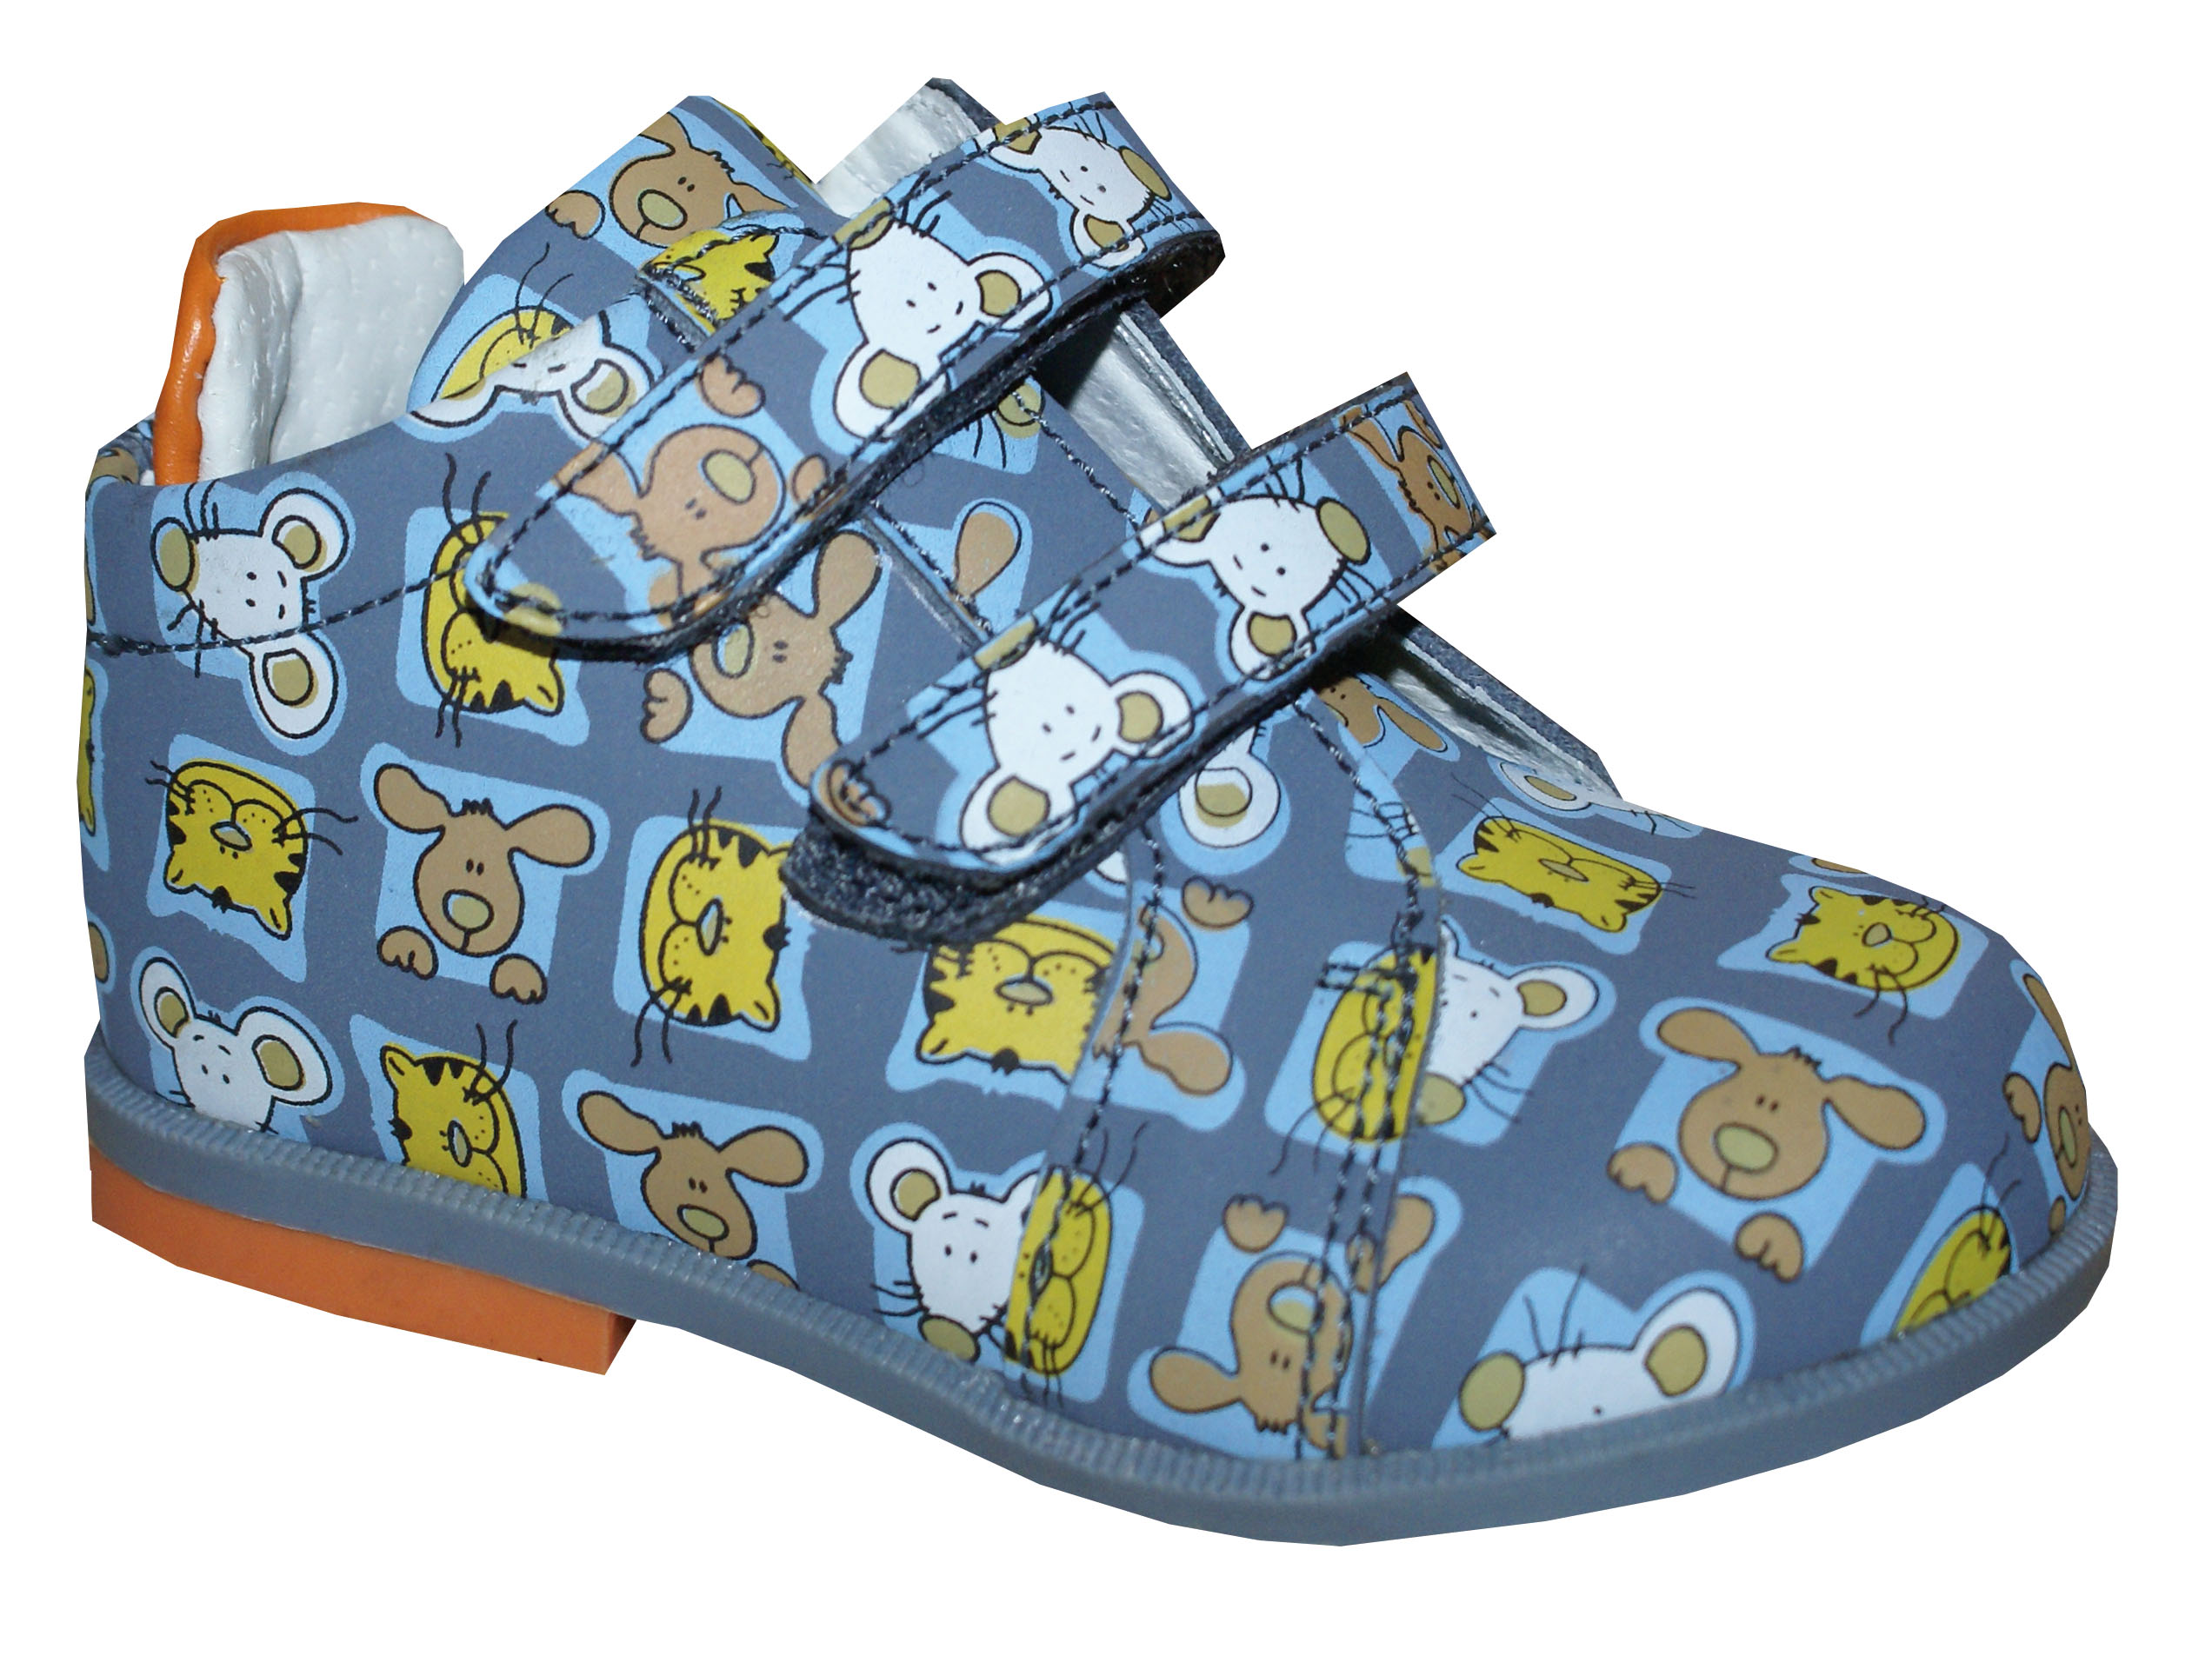 Ботинки и полуботинки Barkito Ботинки для мальчика Barkito, серые с рисунком кошки-мышки